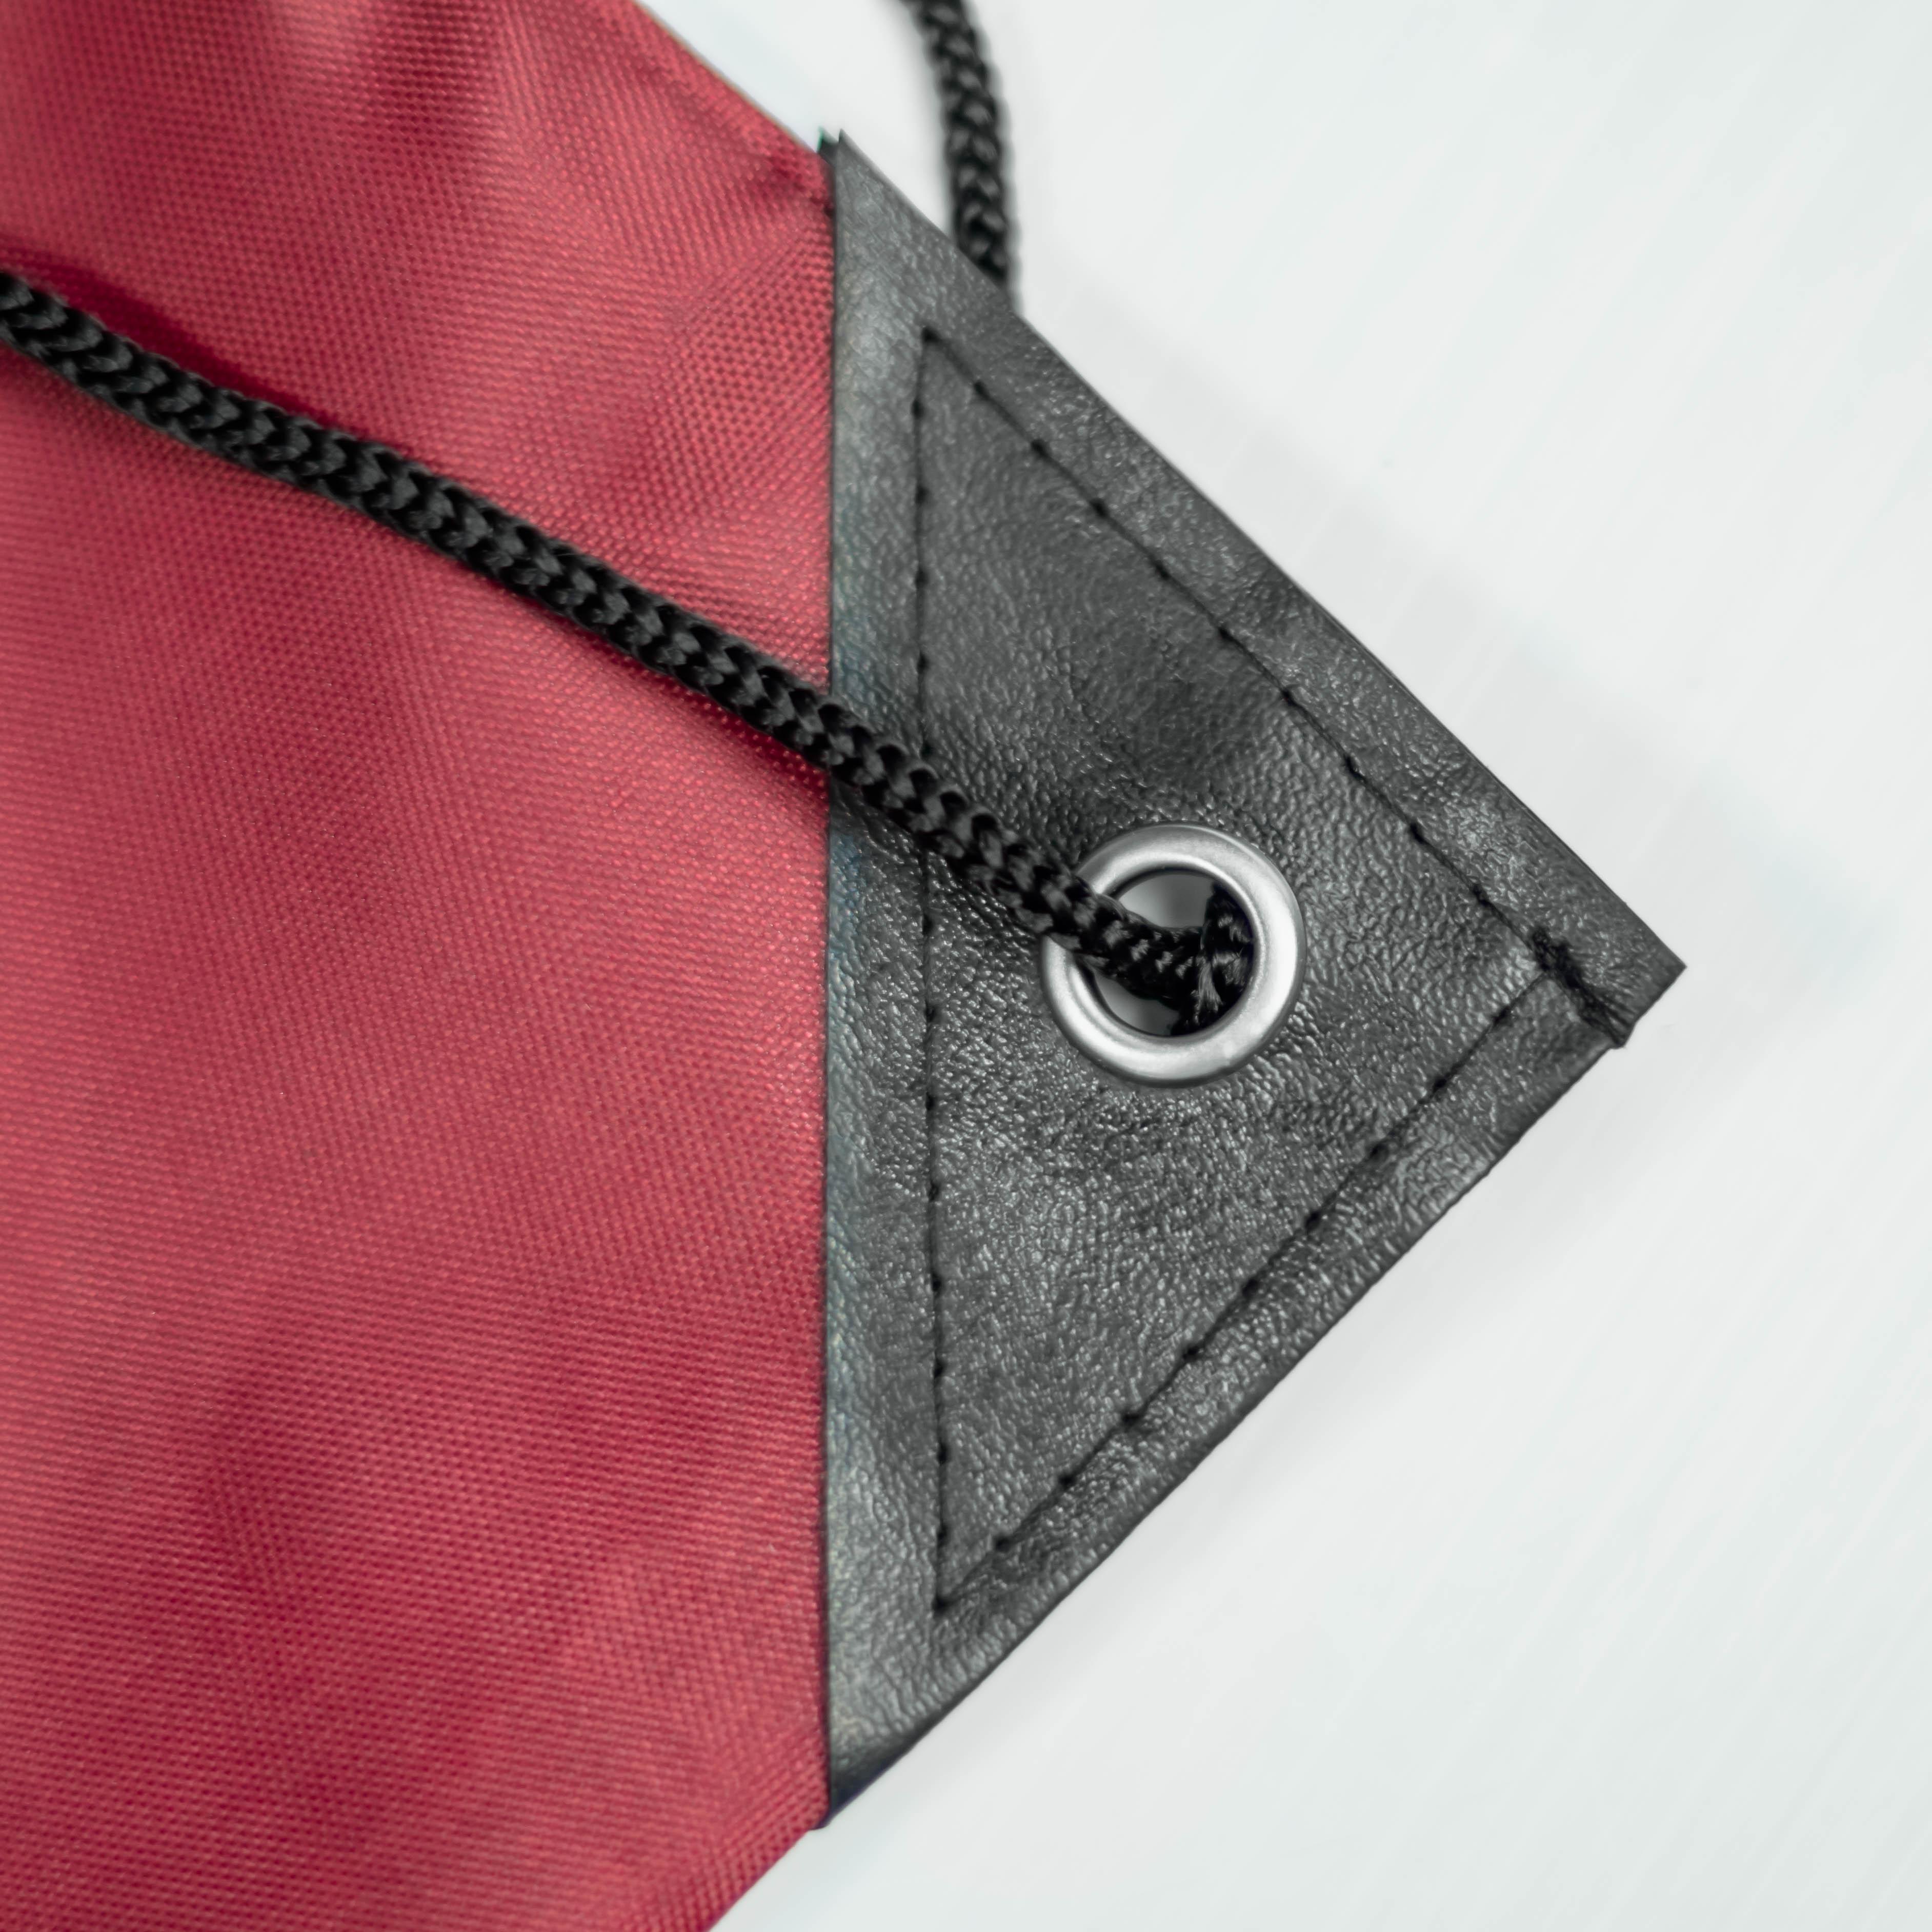 c3dc3312e446 Drawstring Nylon Tote Bag   Drawstring Sportpacks - Imprint.Com